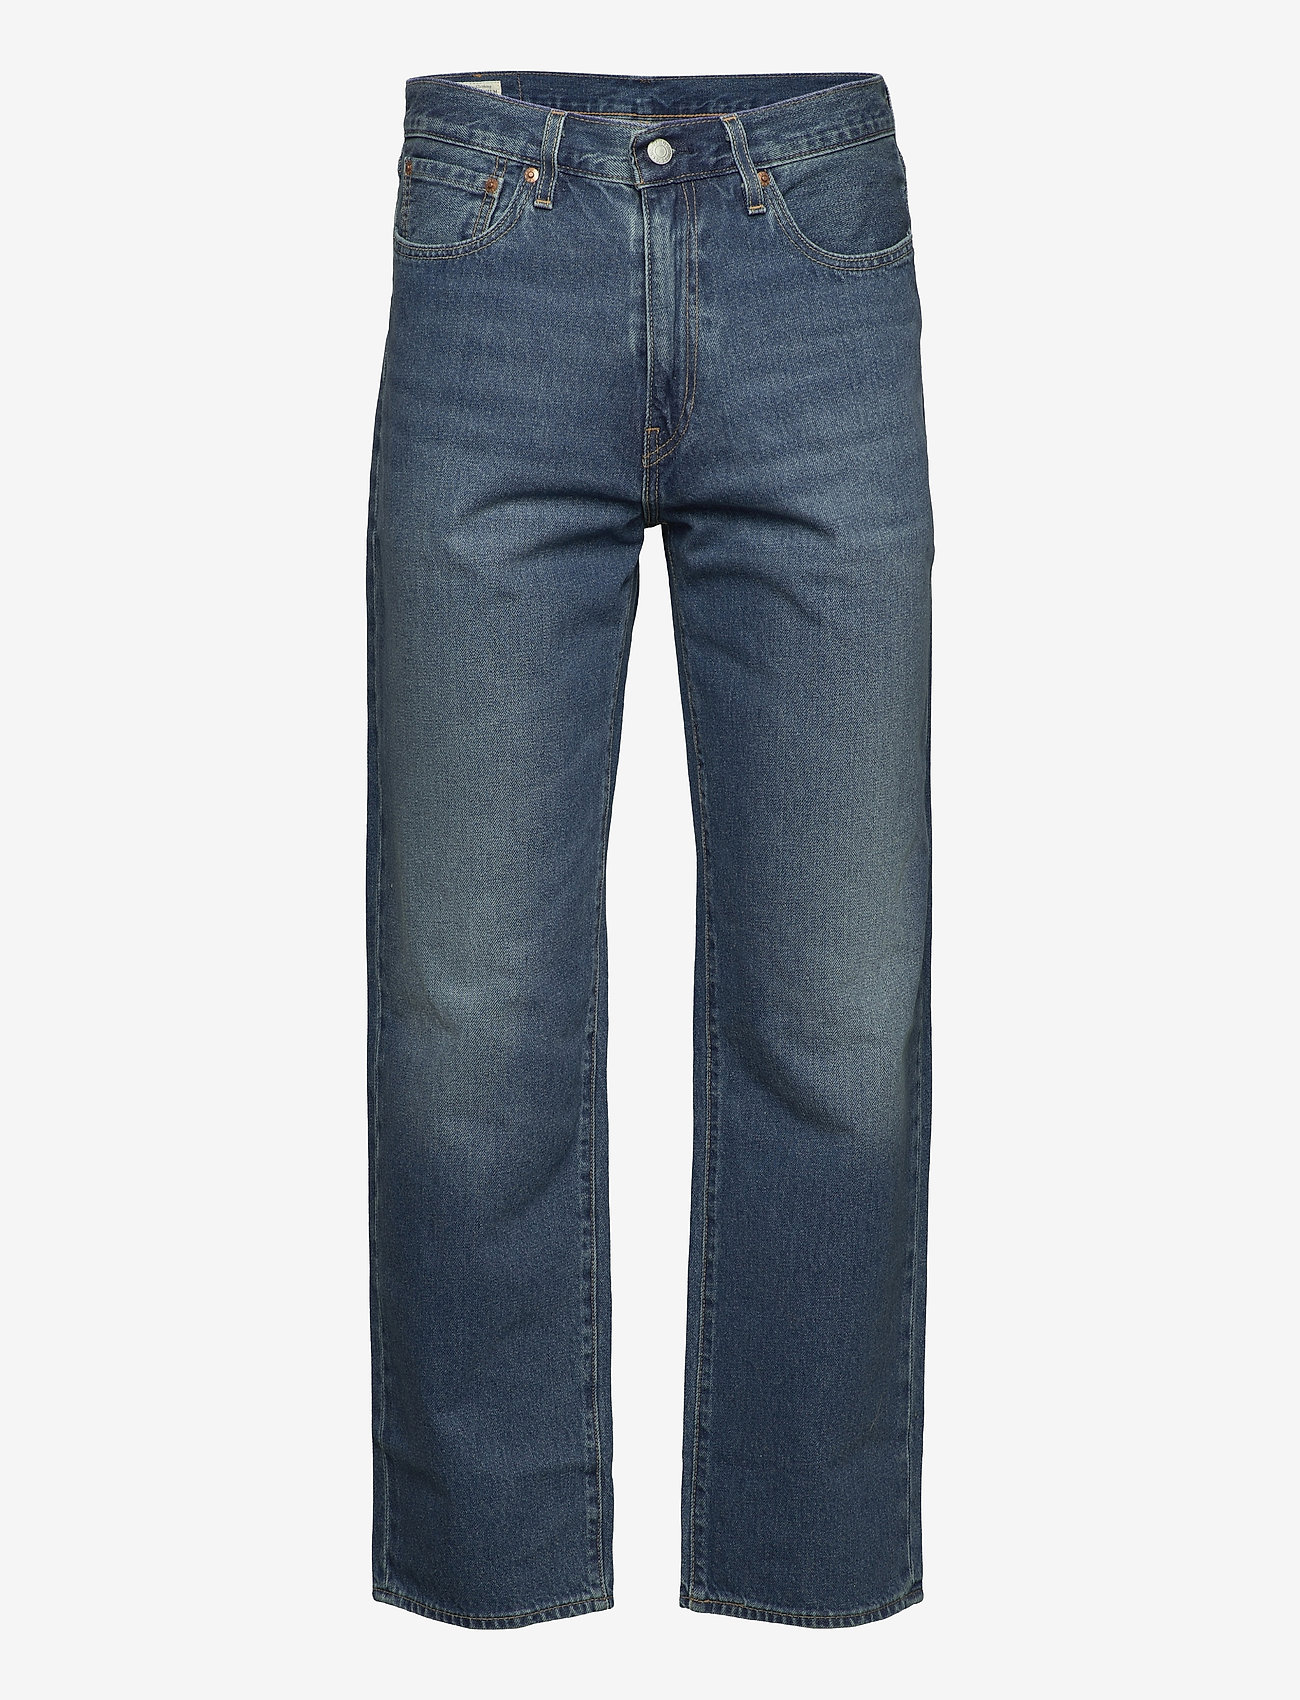 LEVI´S Men - STAY LOOSE DENIM EYED HOOK - relaxed jeans - med indigo - worn in - 0